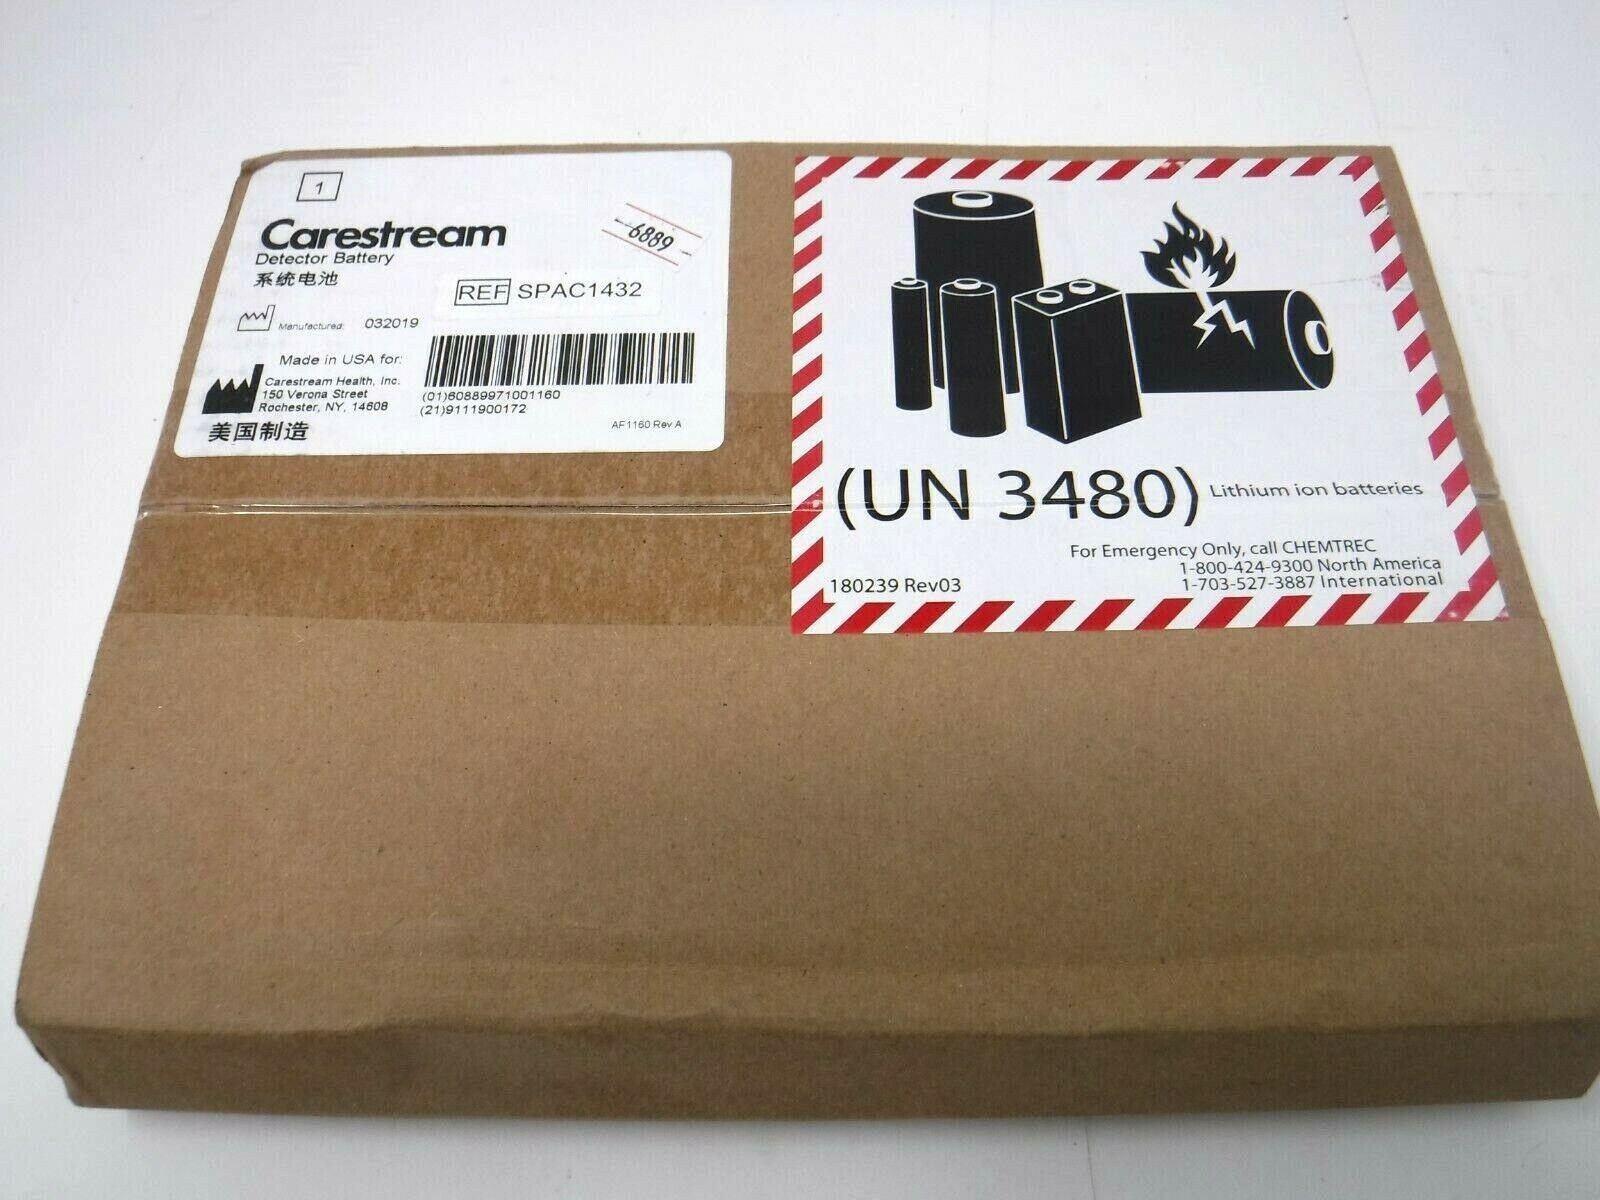 Carestream Detector Battery SPAC1432 *BRAND NEW*